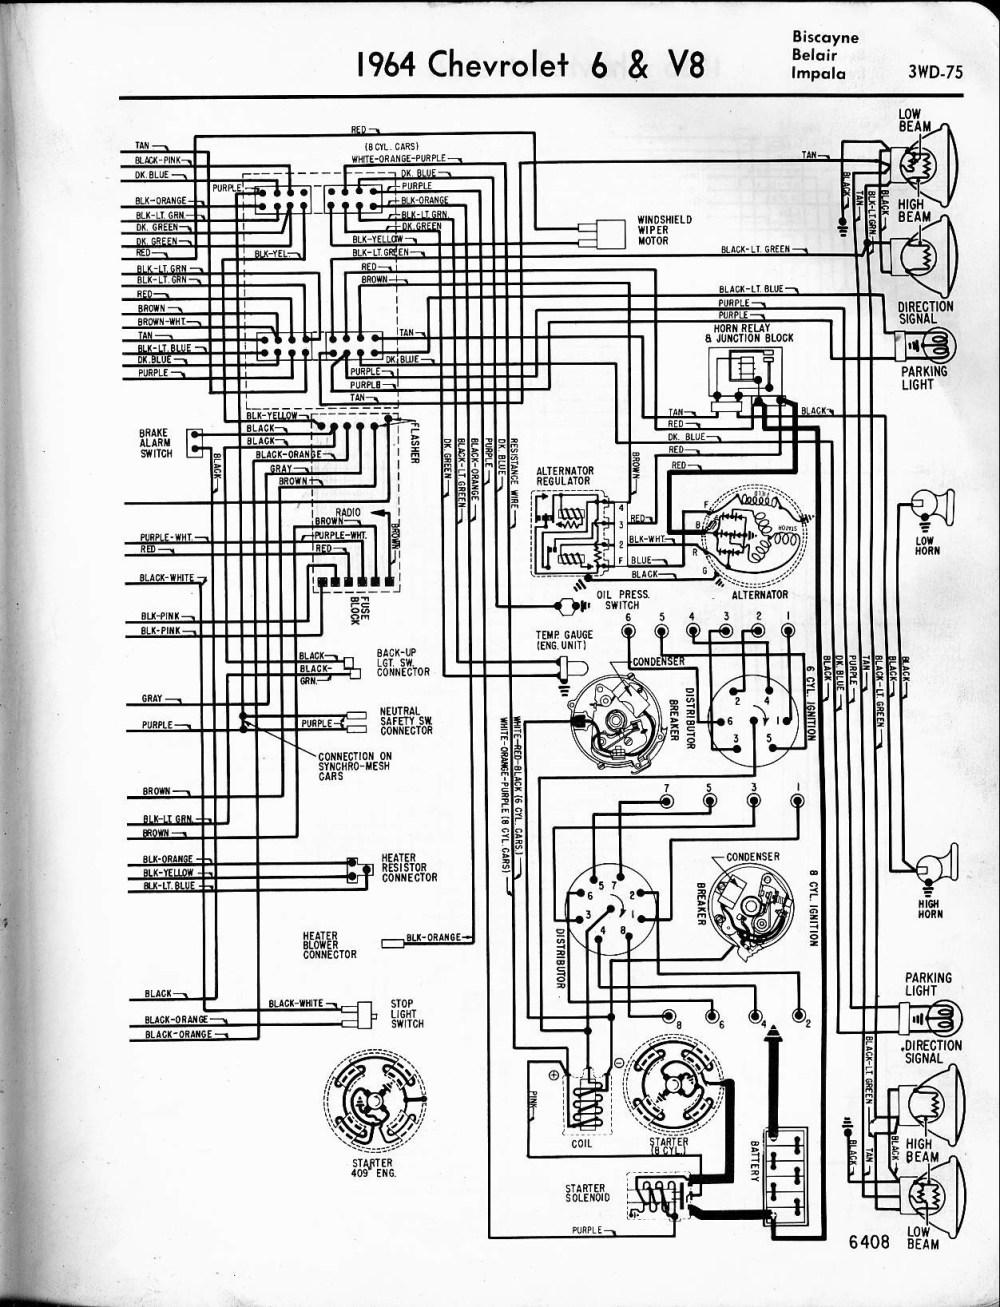 medium resolution of 2005 chevy impala engine diagram wiring diagram used 2007 chevy impala engine wiring diagram